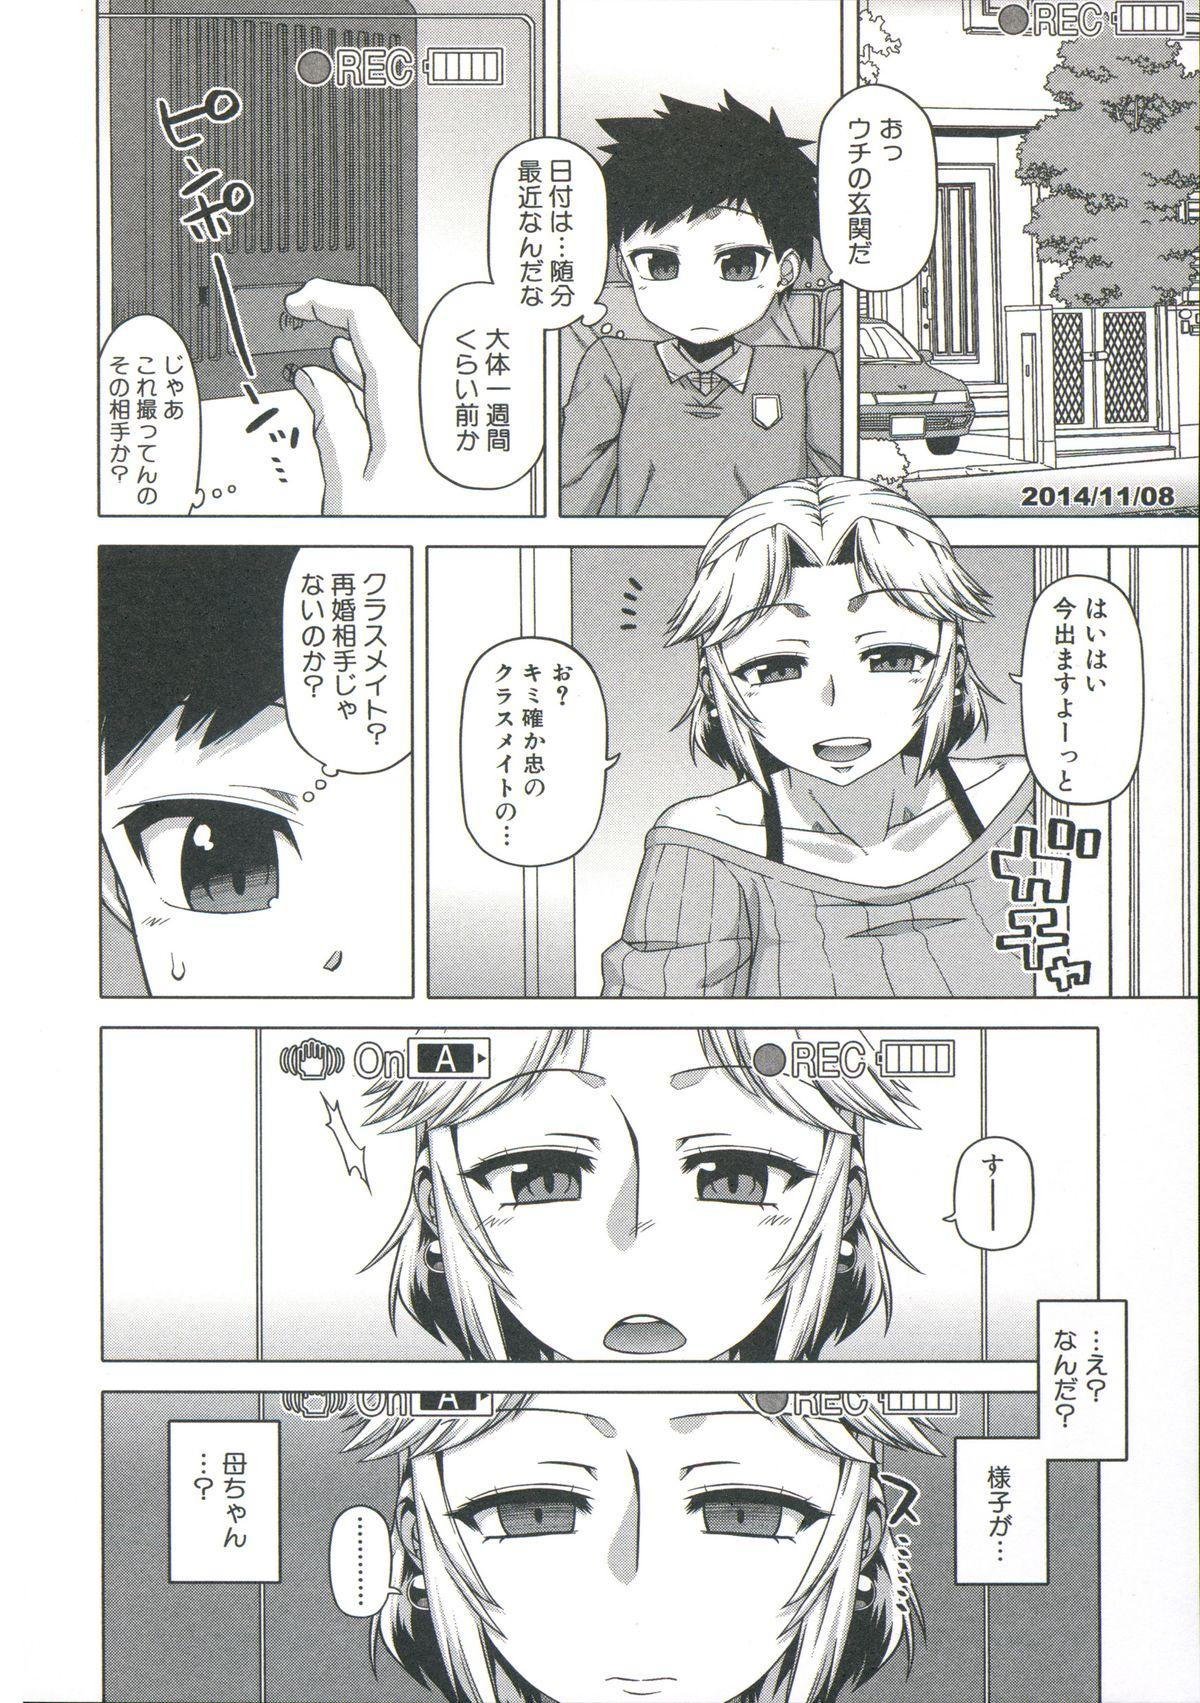 [Takatsu] Ou-sama Appli - King App 76